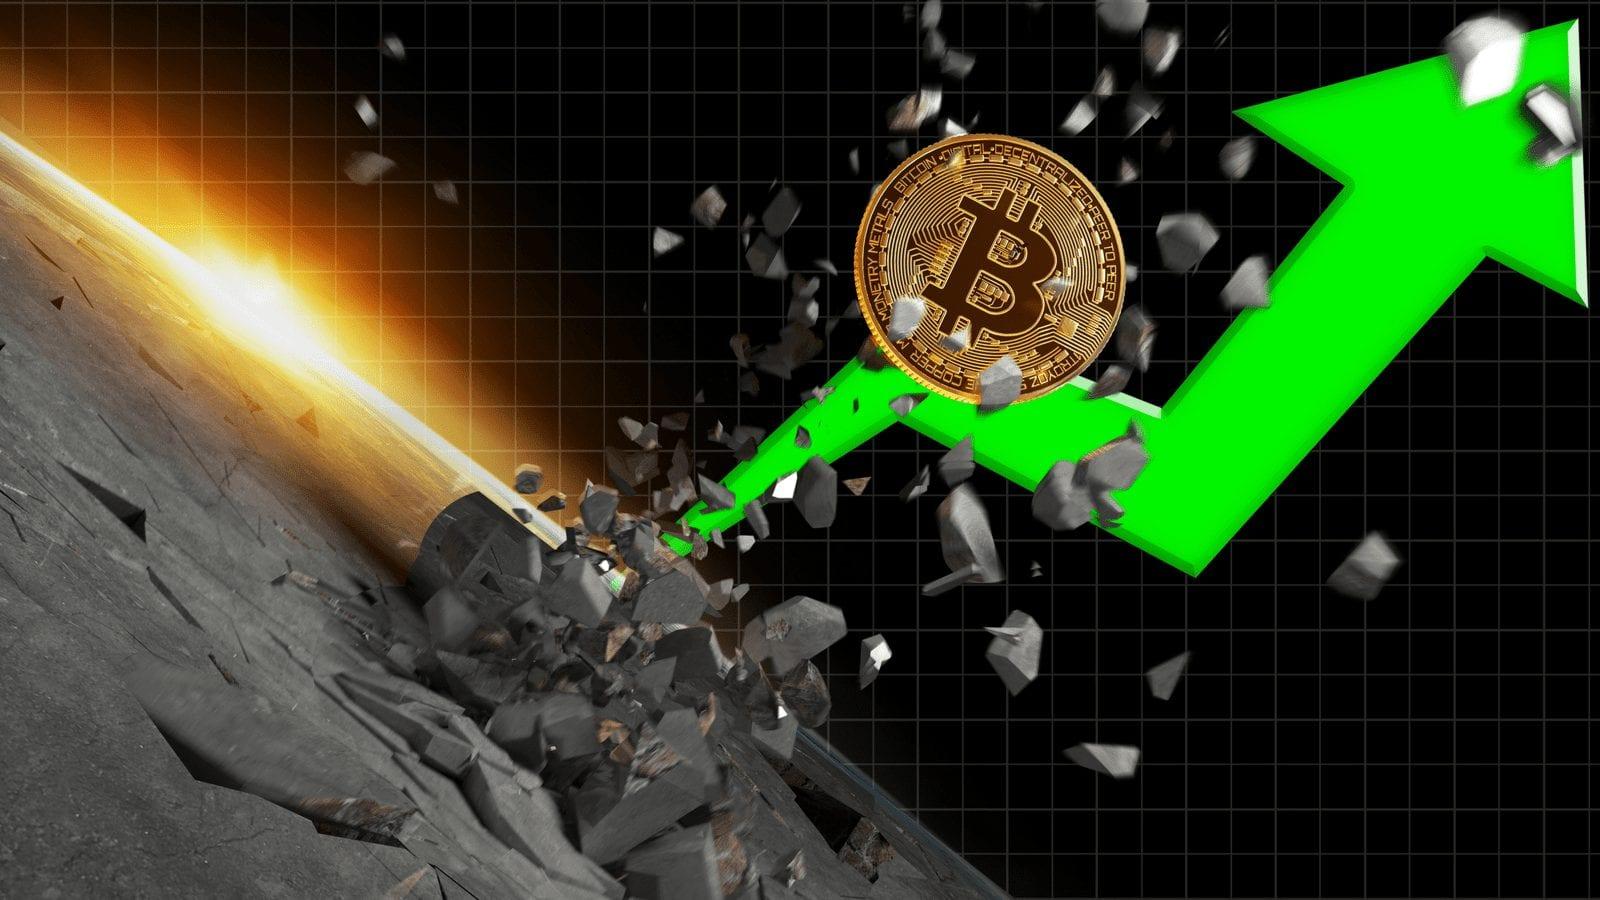 The Crypto Market Is Bullish Today, Hits New 2019 High